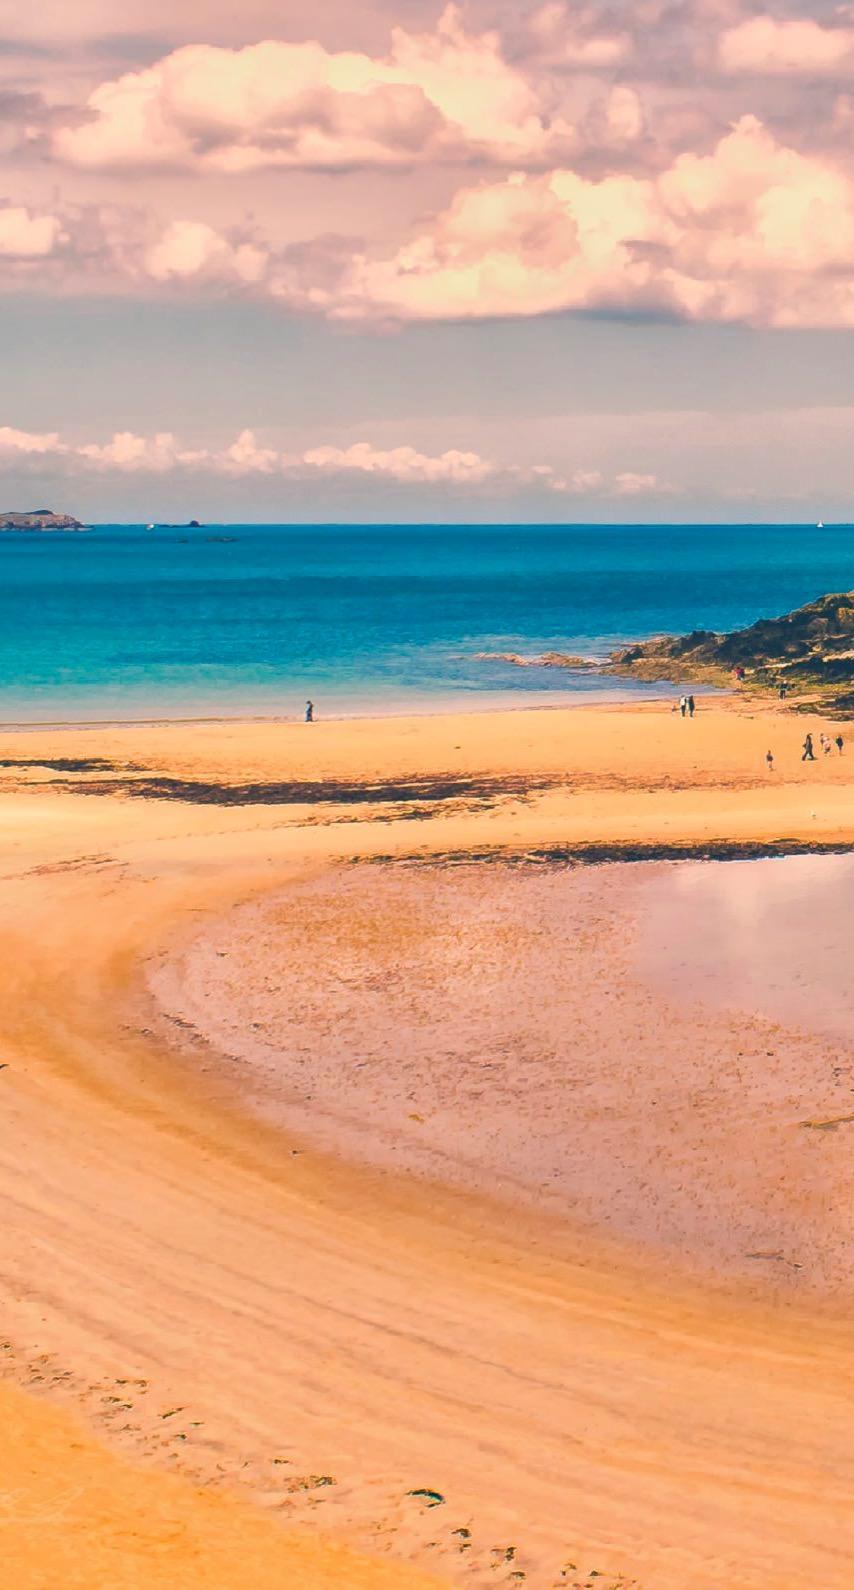 Beach Landscape Wallpaper Sc Iphone8